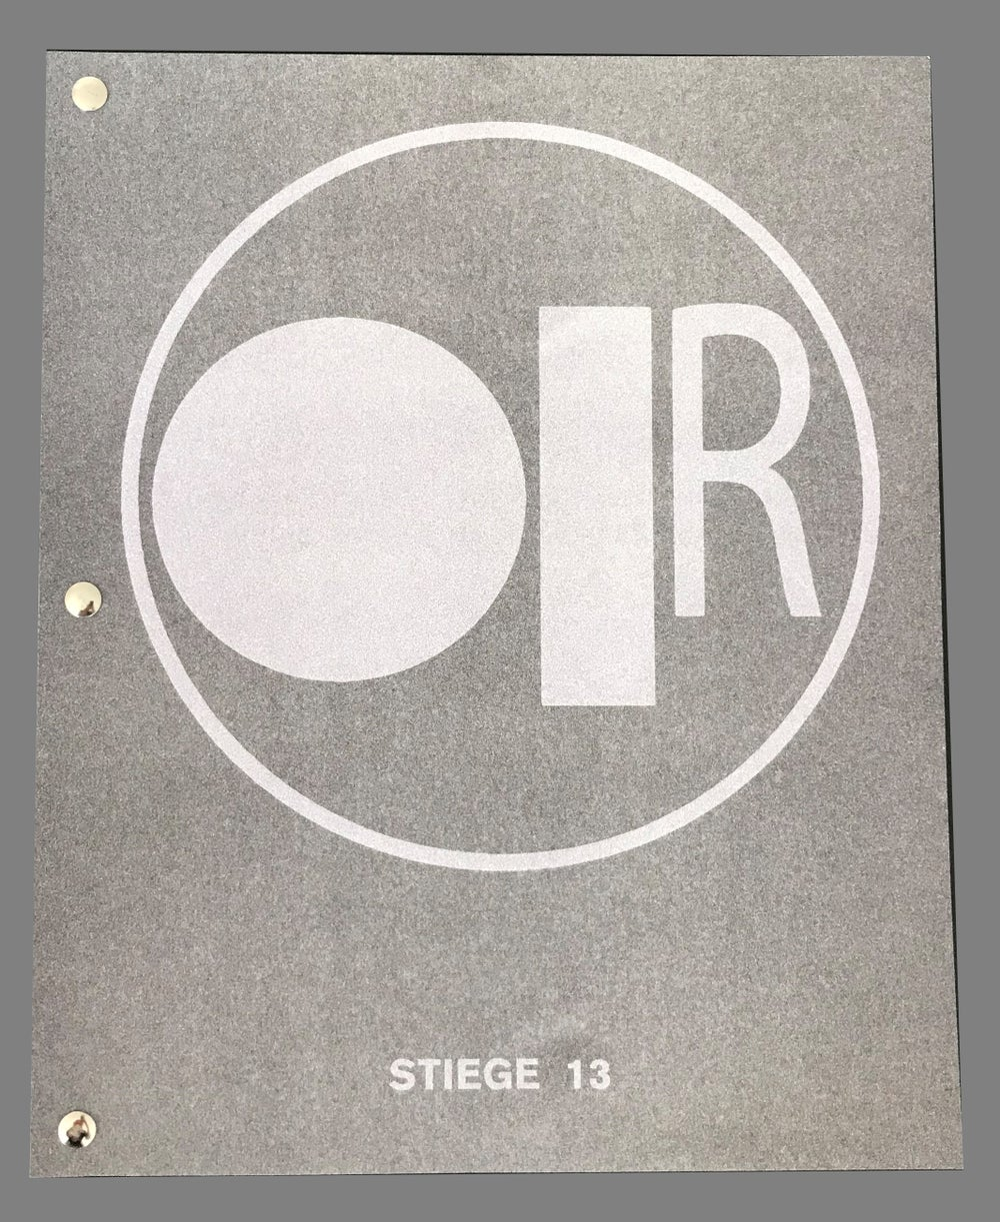 Image of Robert Pawliczek: Infinite Riff